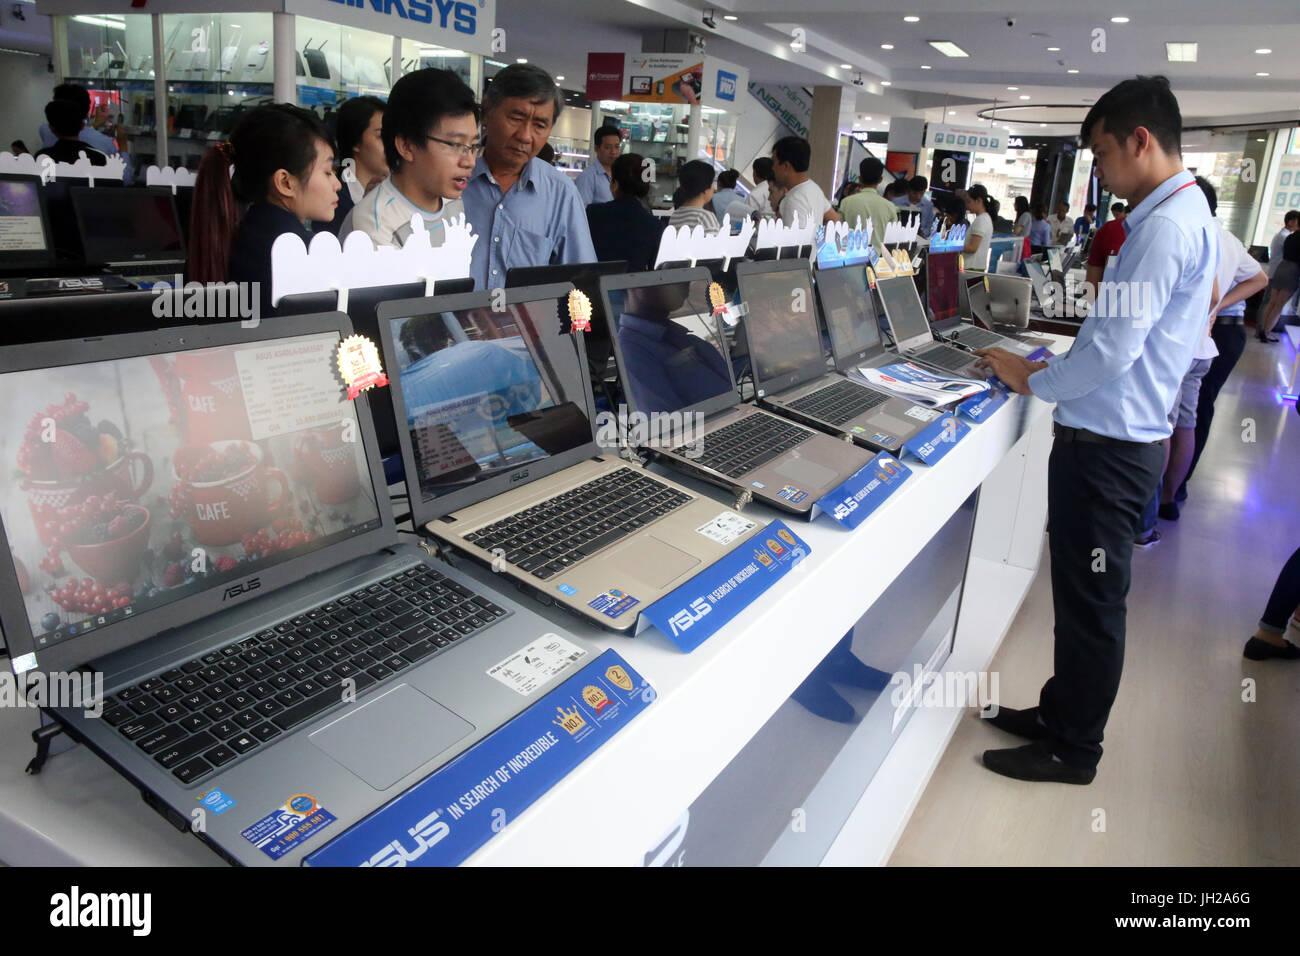 Electronics shop. Laptops. Ho Chi Minh City. Vietnam. - Stock Image